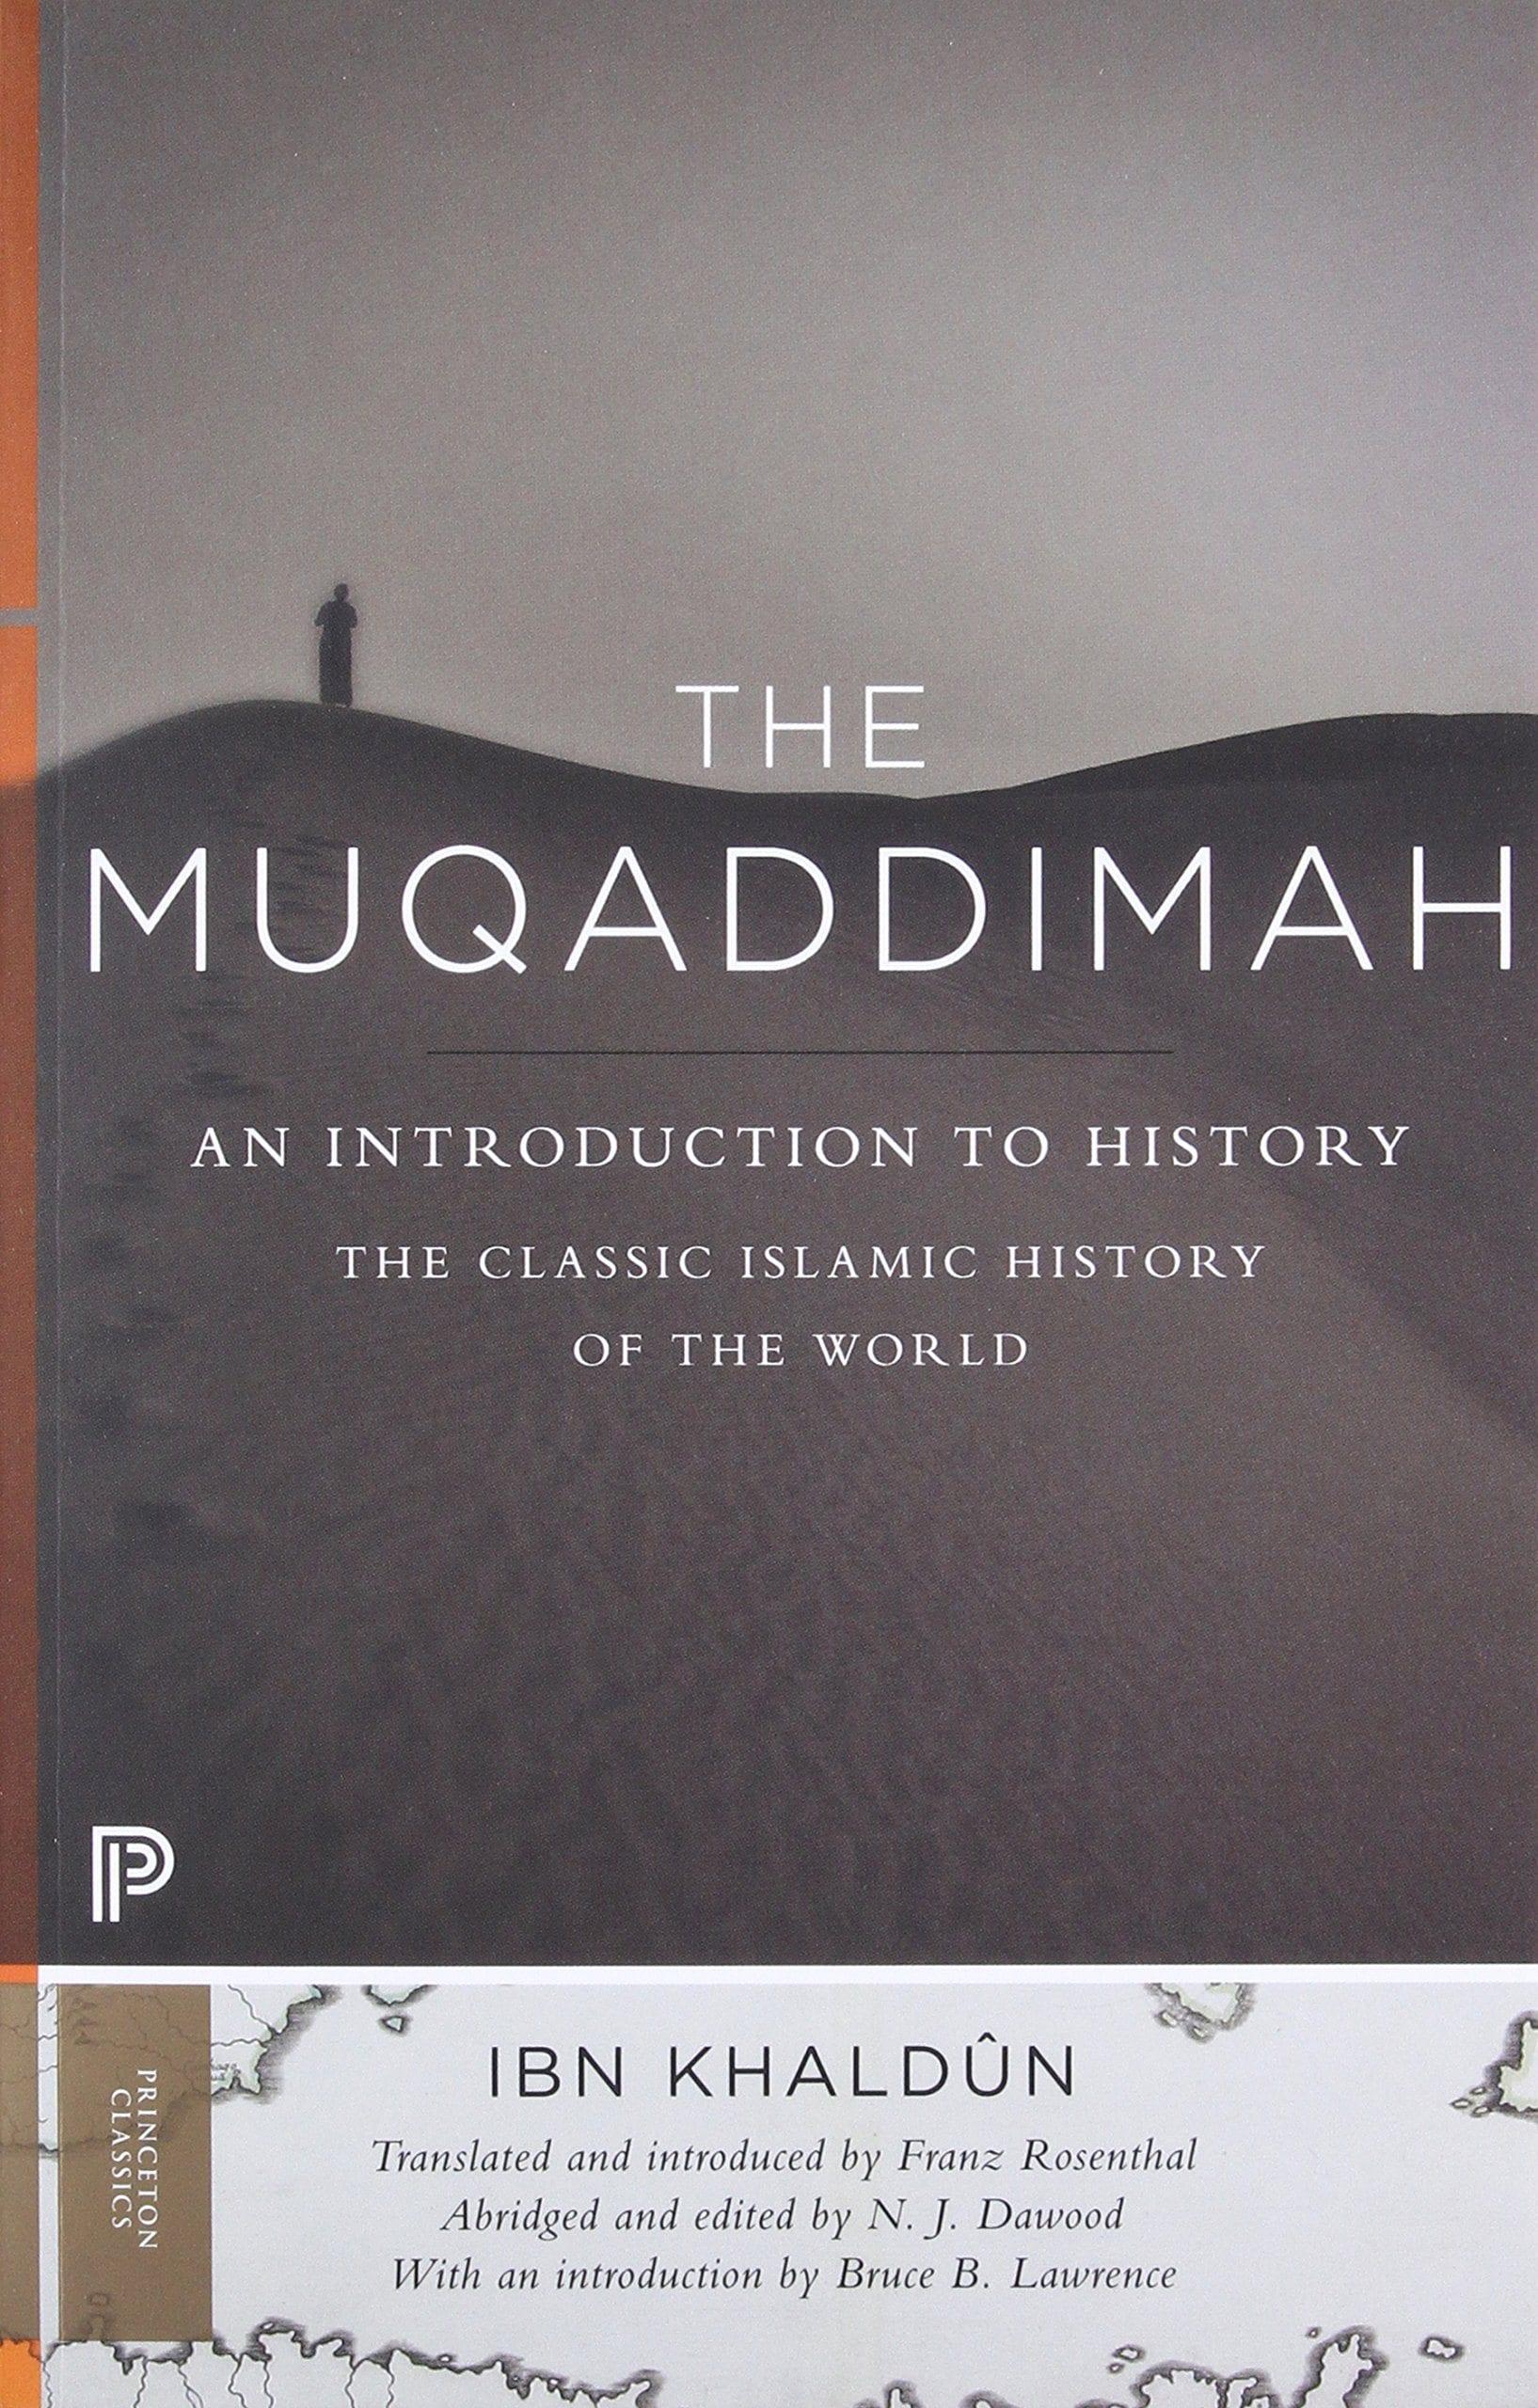 Best Islamic Books to Read (8)